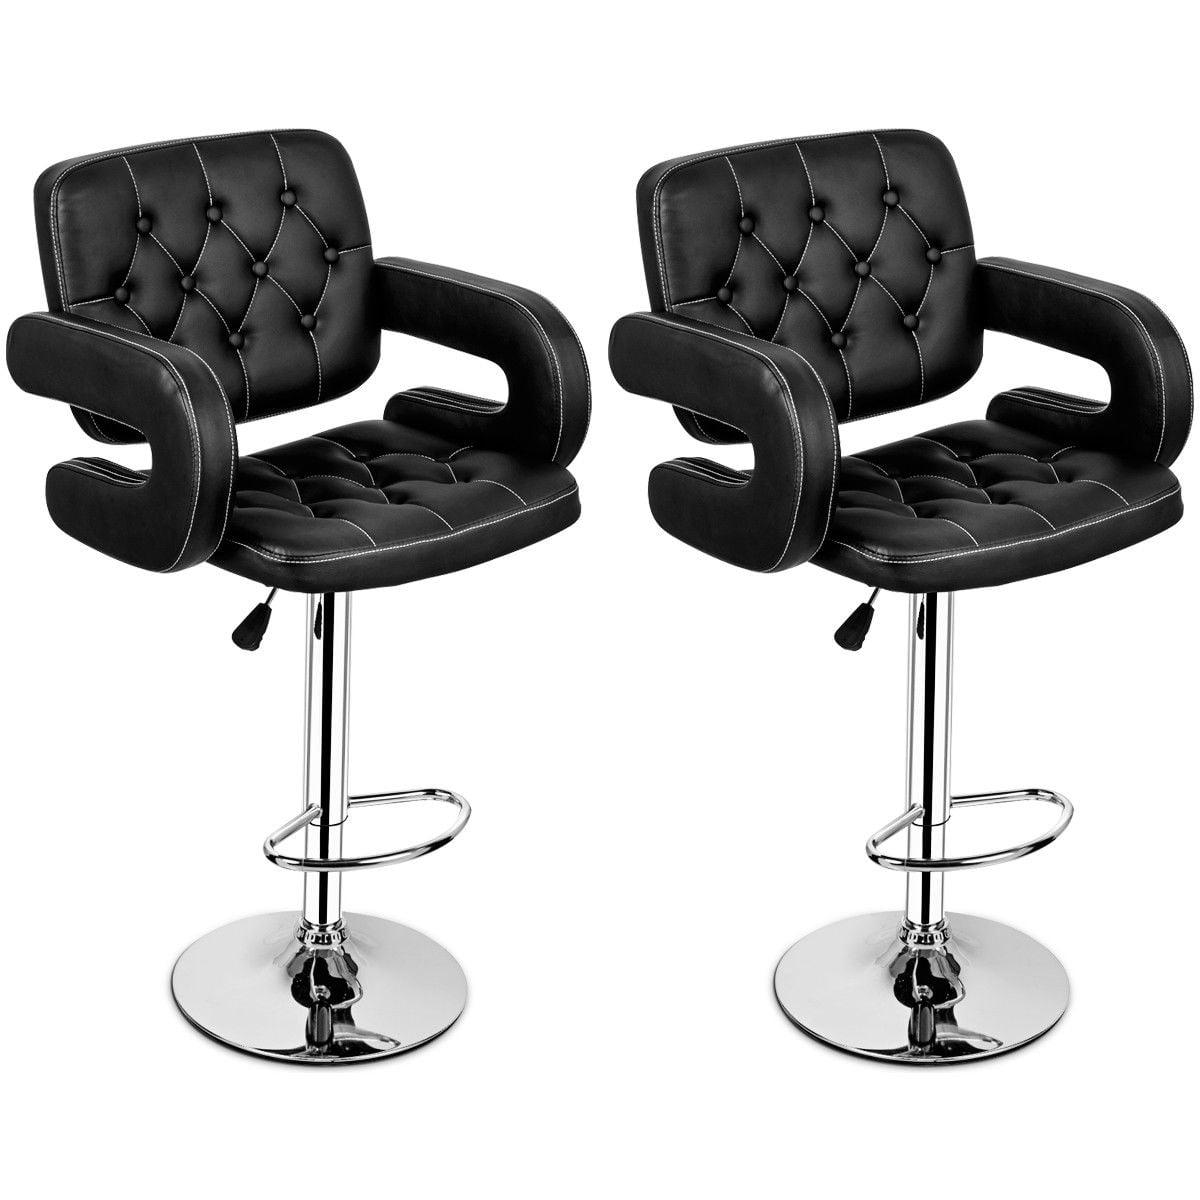 Costway Set of 2 PU Leather Swivel Bar Stools Hydraulic Pub Chair Adjustable Black by Costway